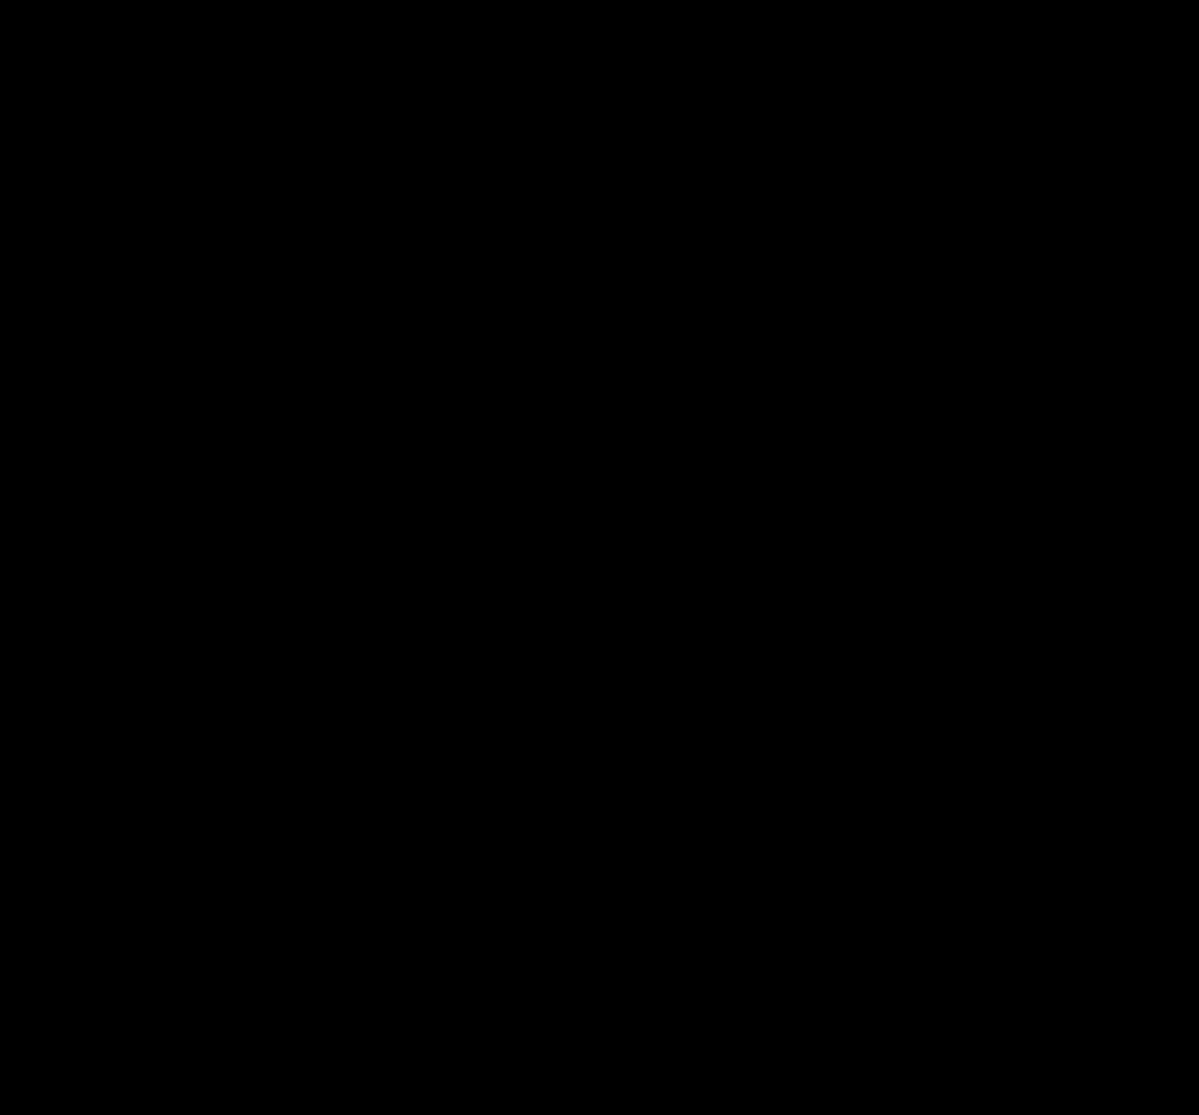 Melonheadz pixie. Dust clipart black and white